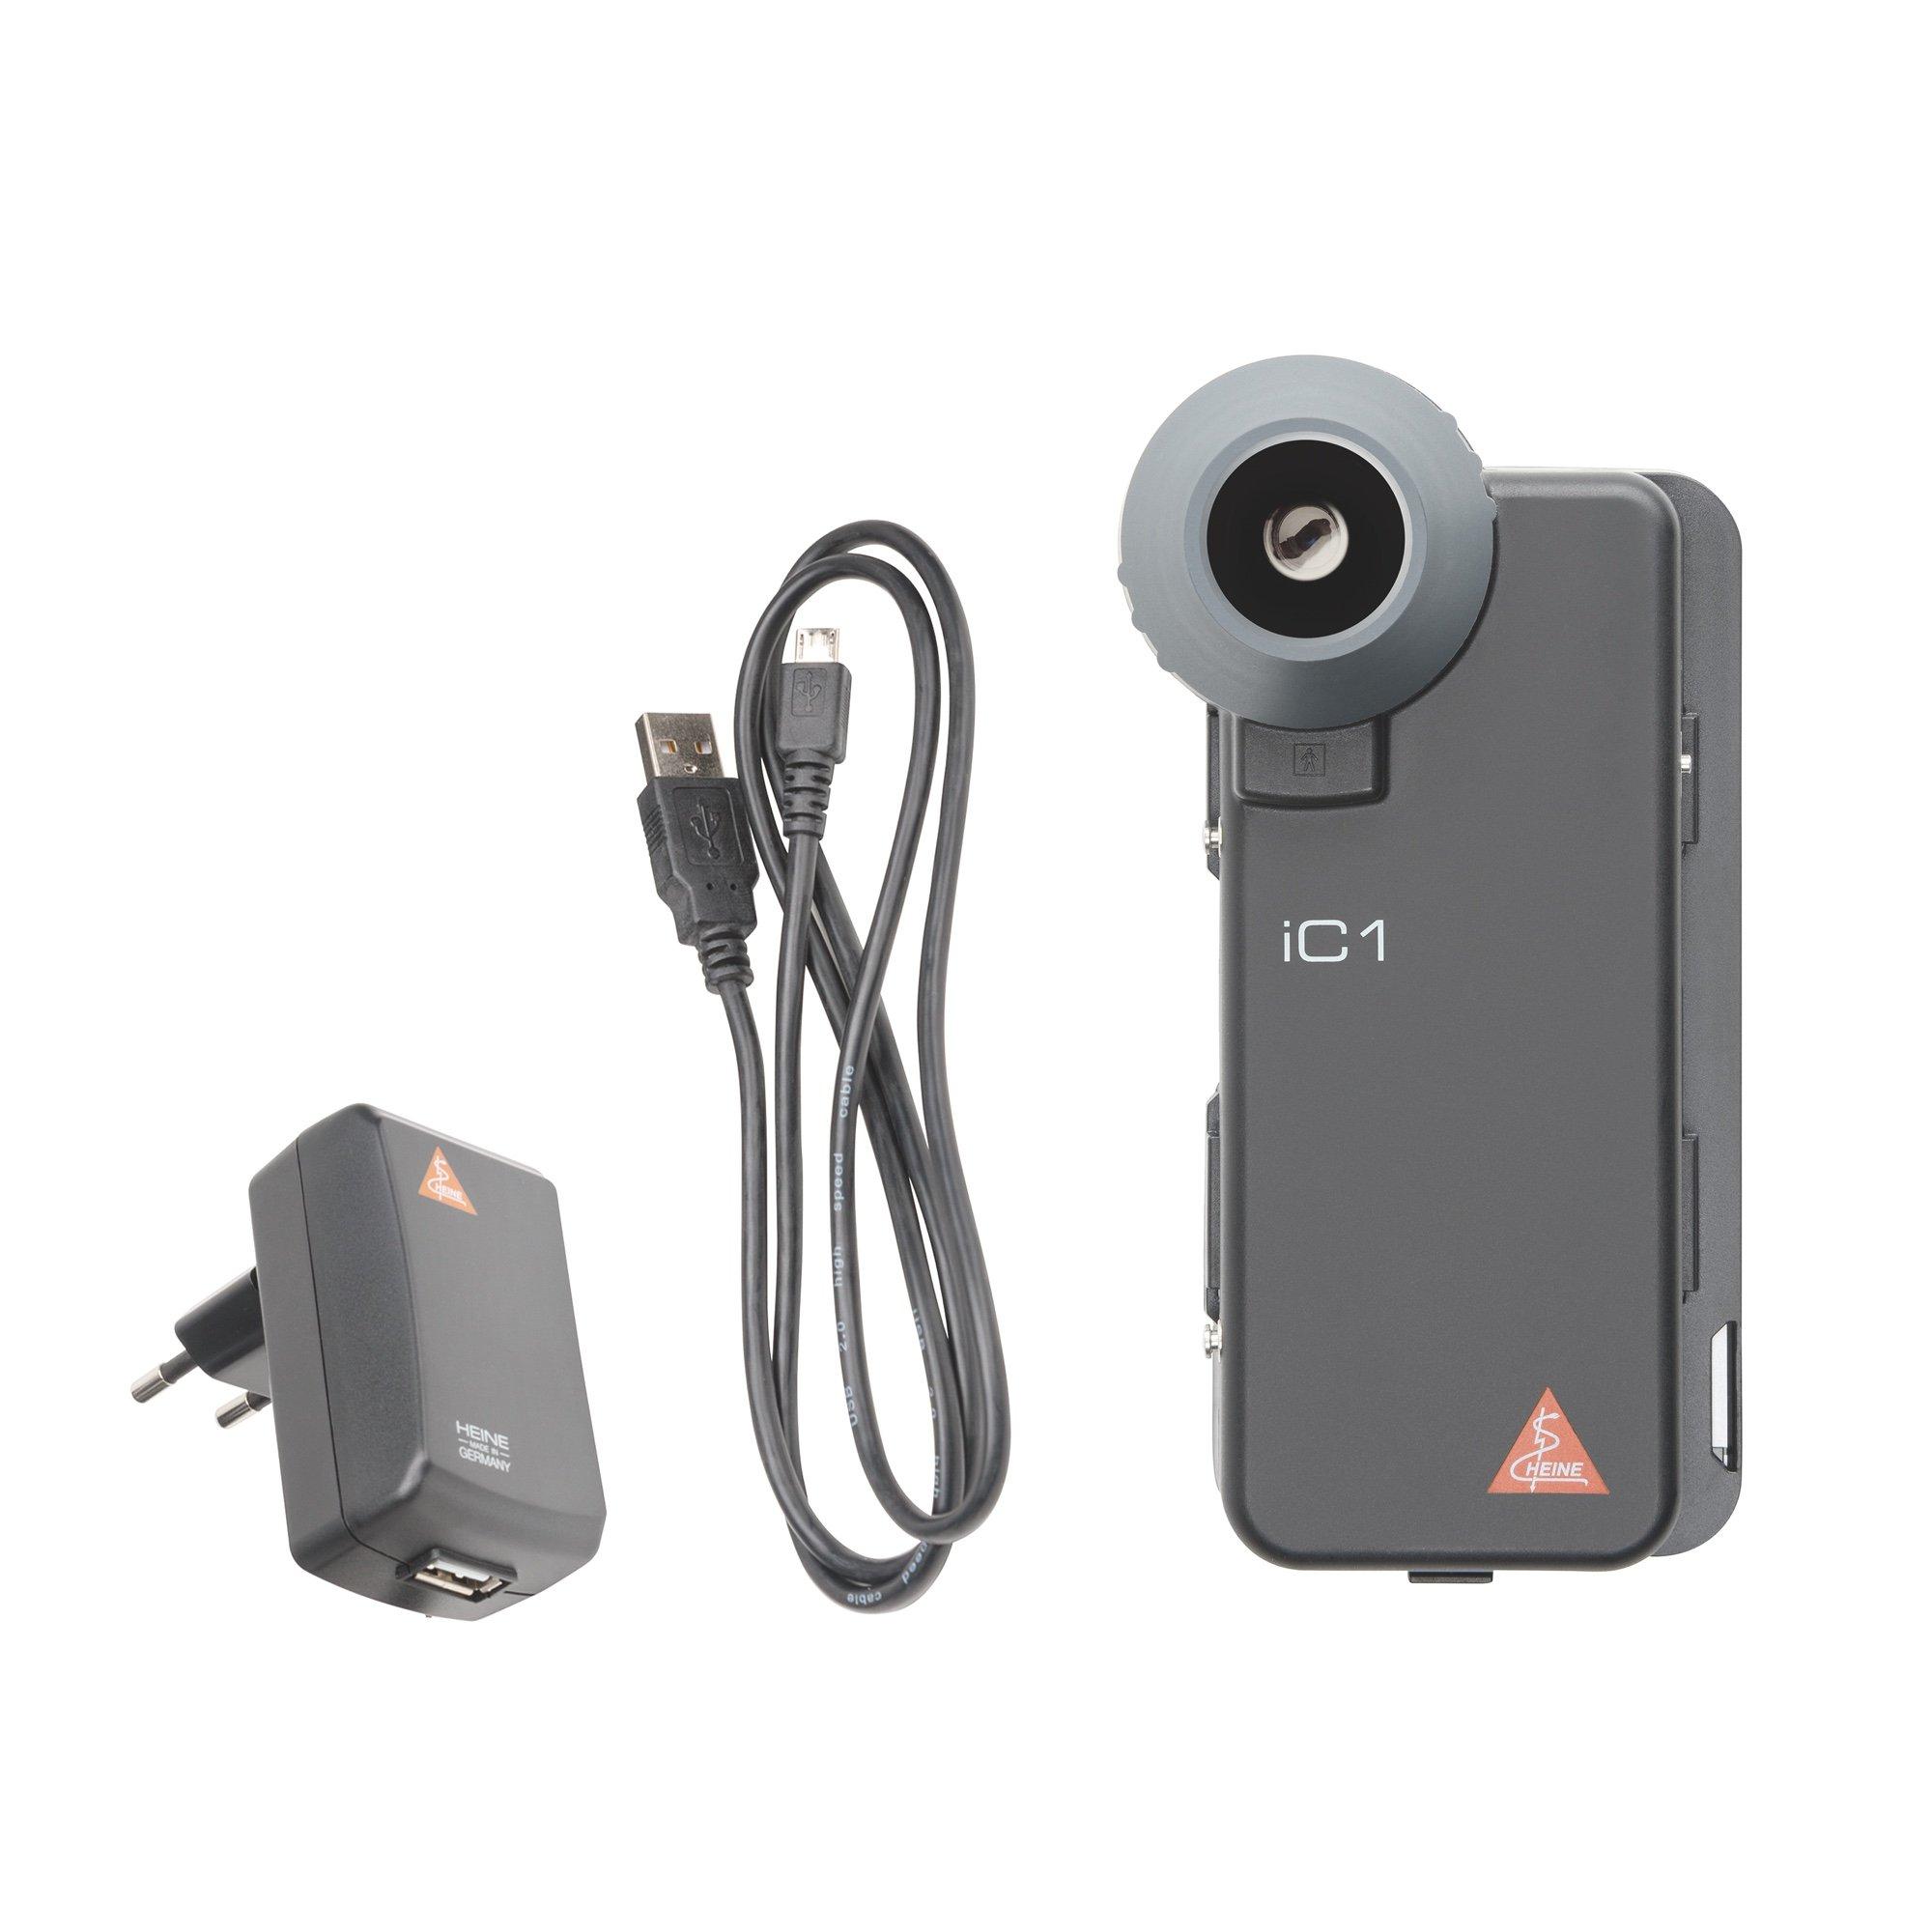 HEINE iC 1 Dermatoscope for iPhone 5/5s/SE